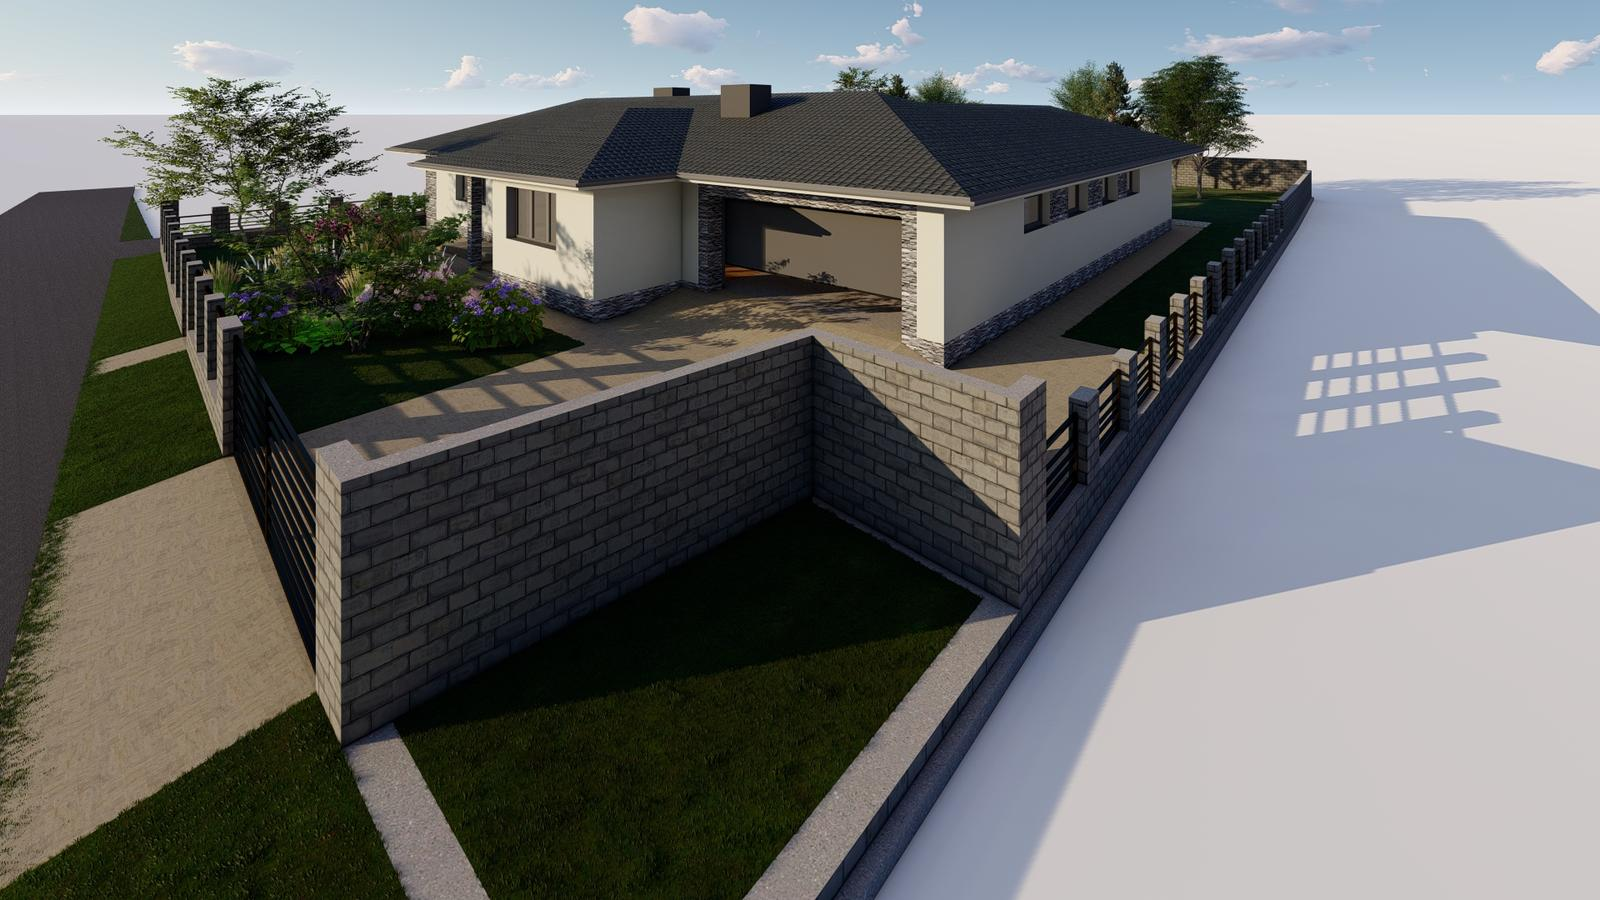 Návrh fasády rodinného domu - Obrázok č. 3